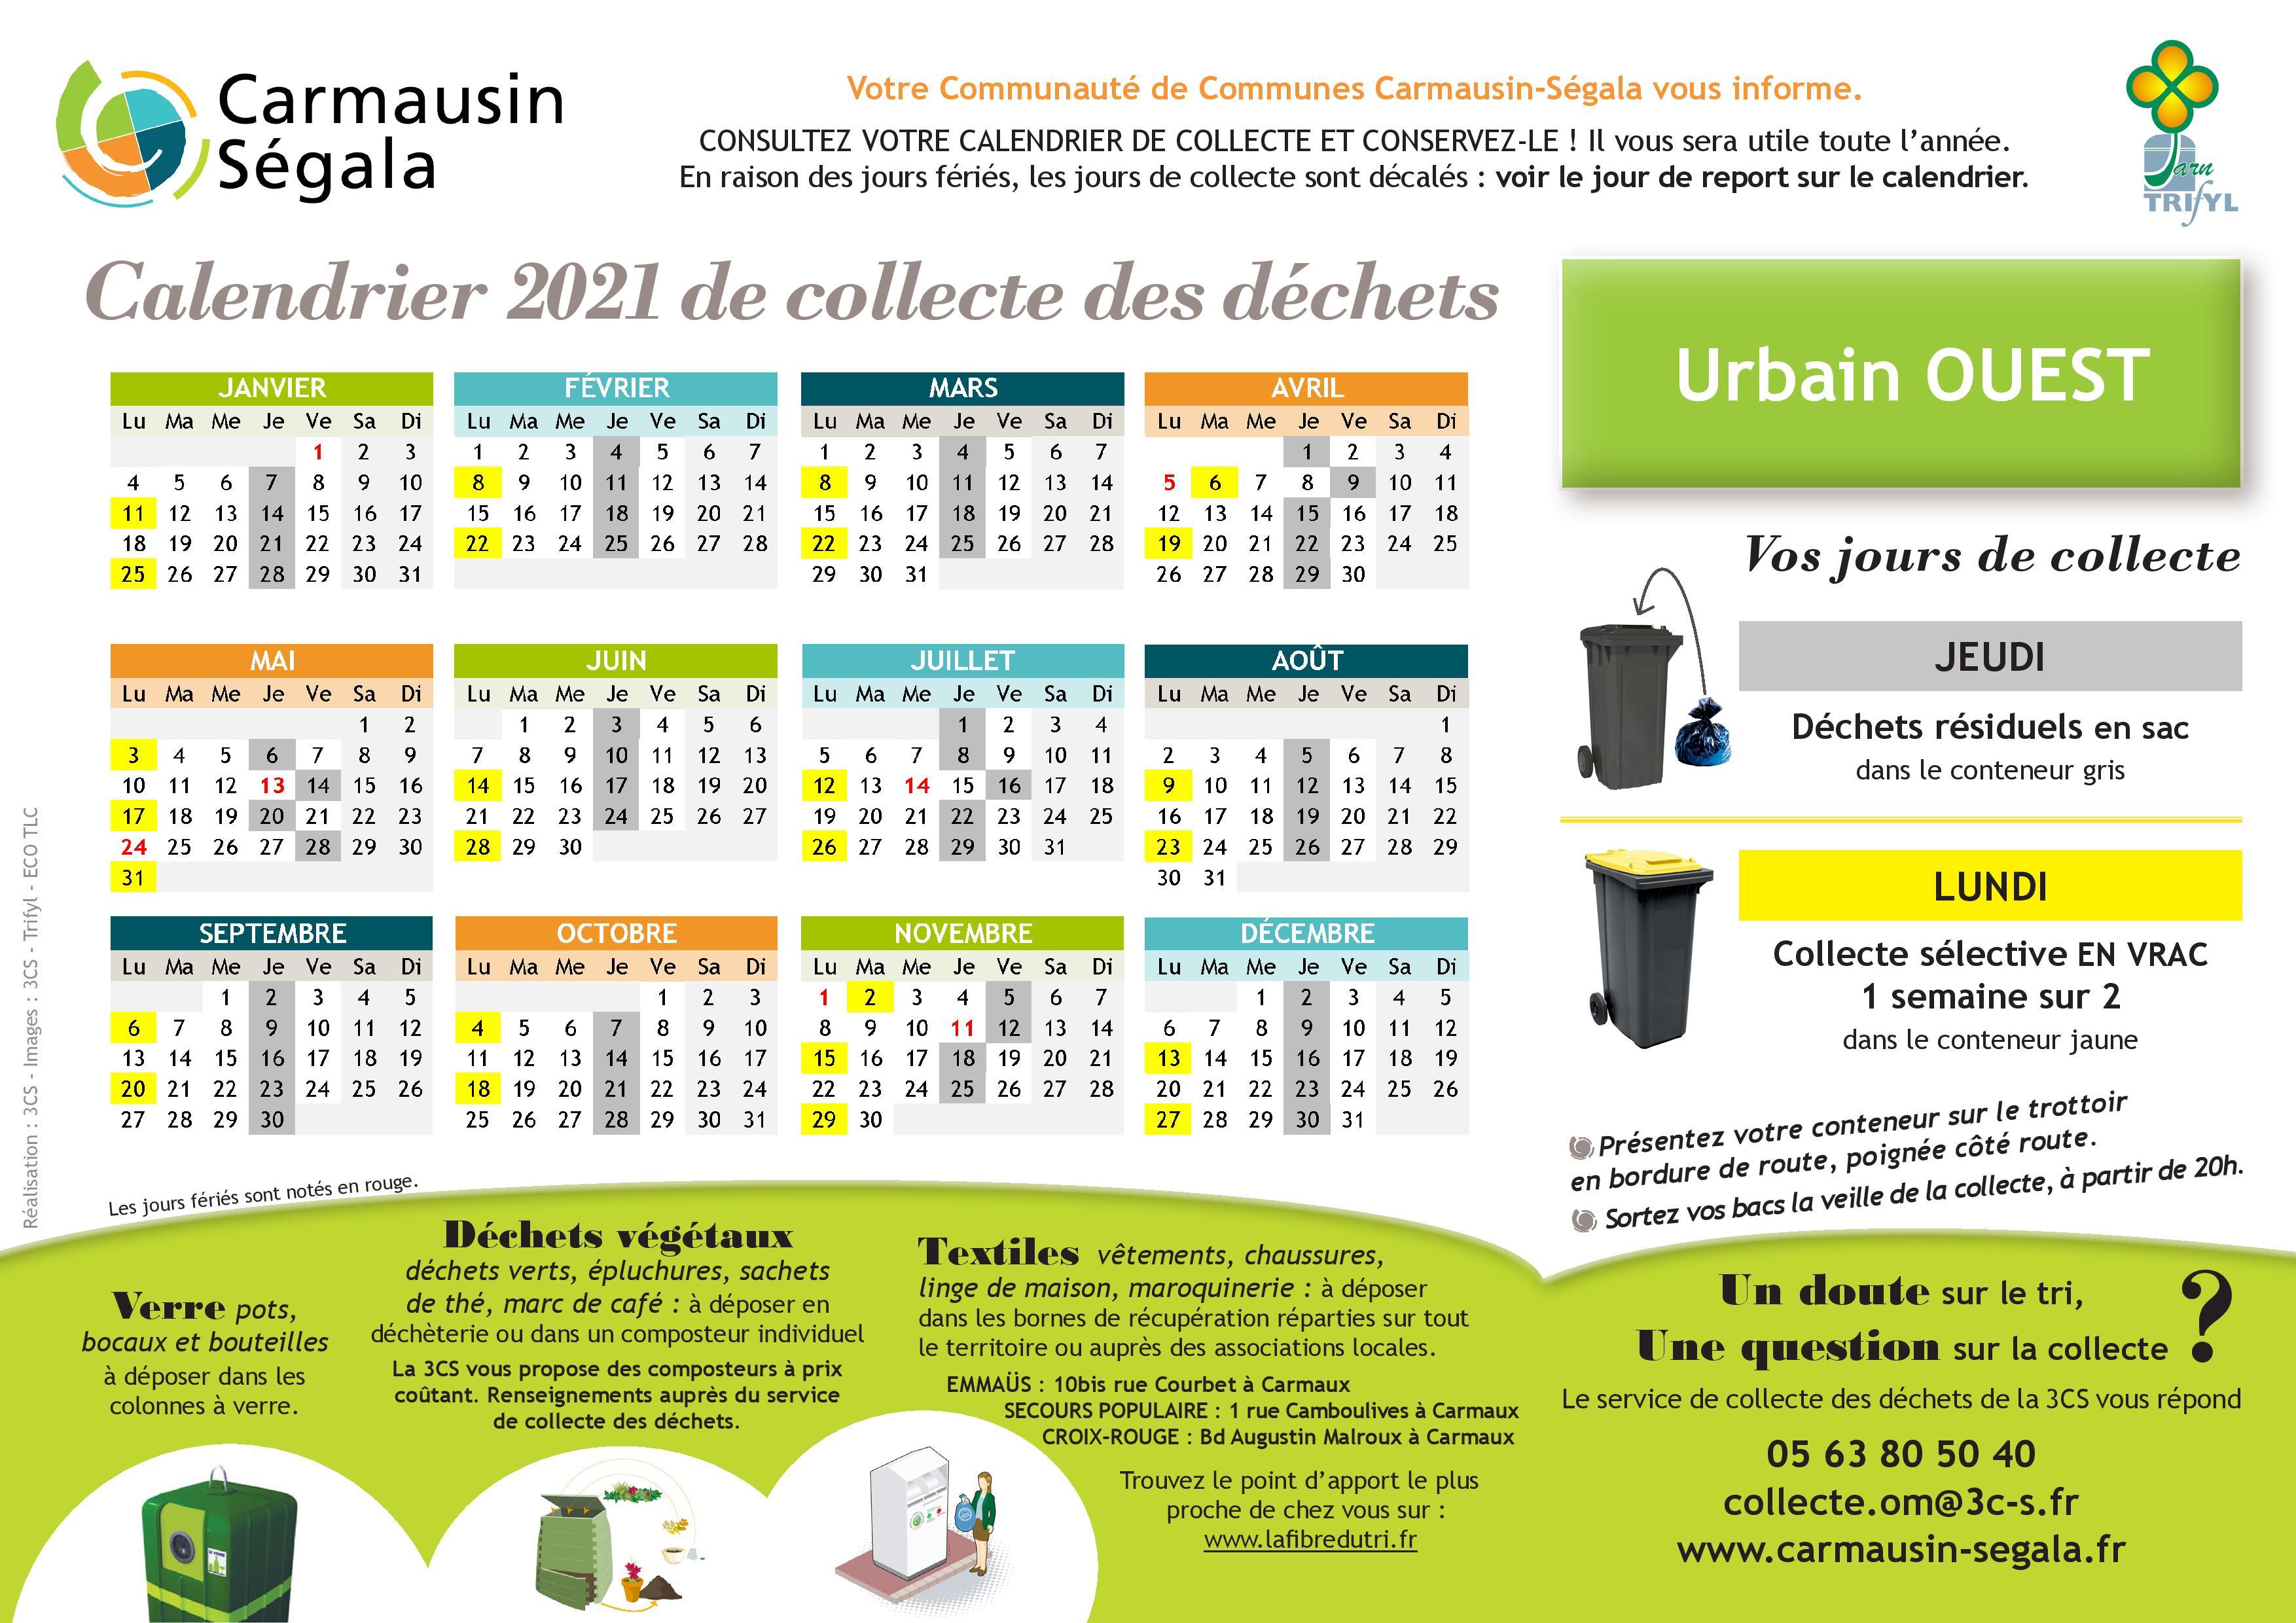 Calendrier OM 2021 Saint Benoit - URBAIN OUEST.jpg